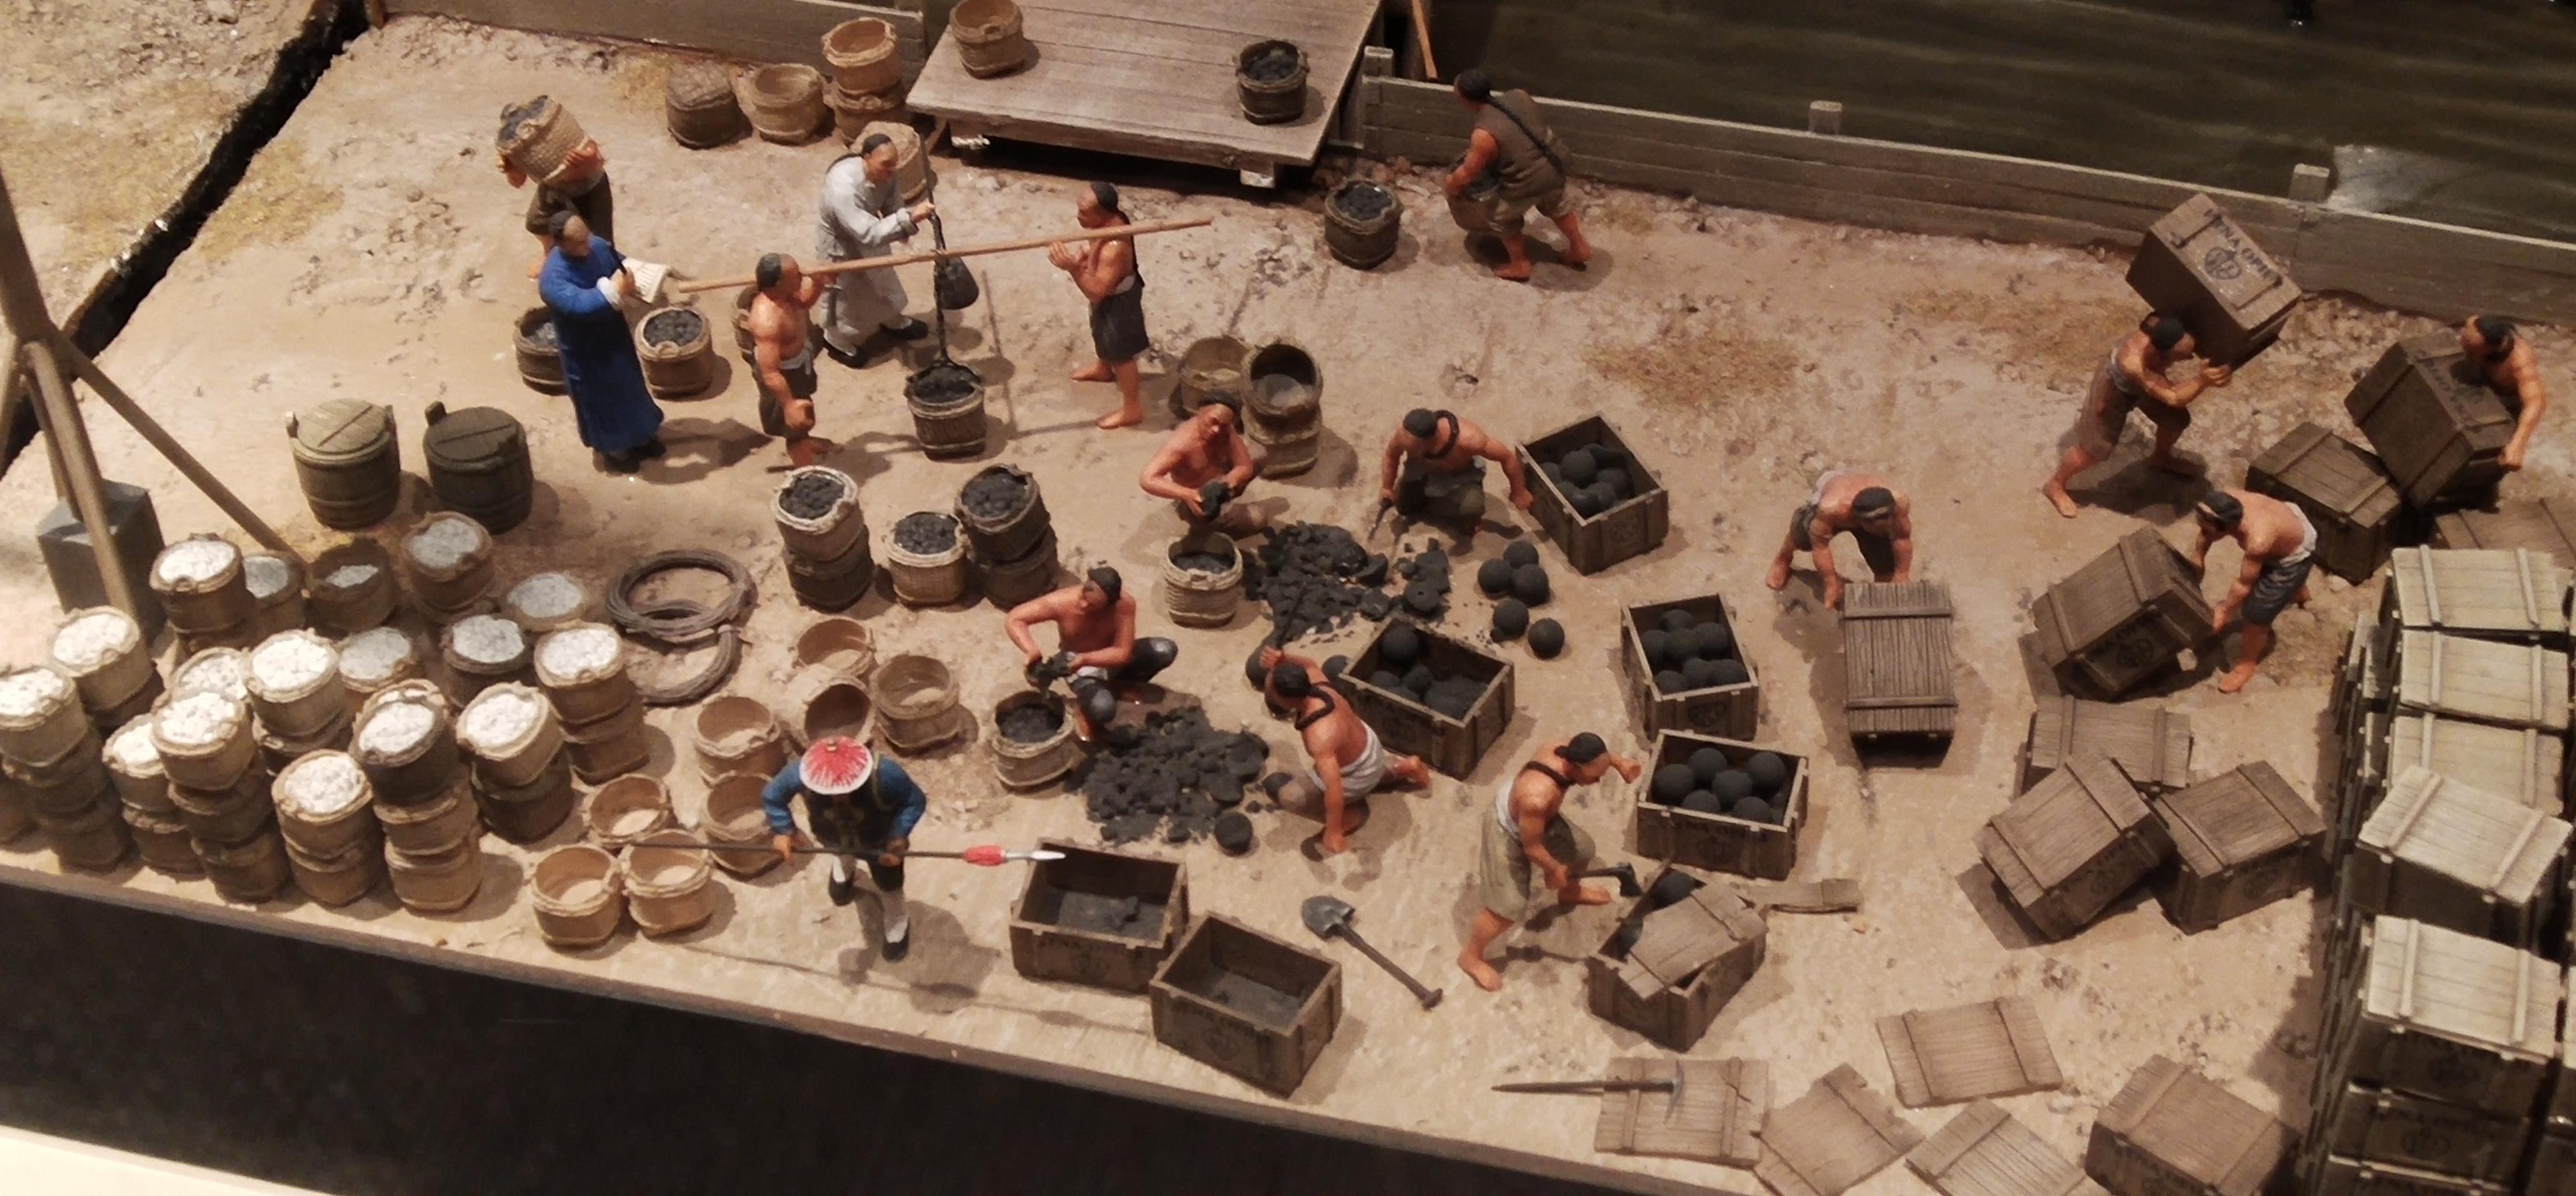 Destruction of opium at Humen scene model at Hong Kong Story exhibition